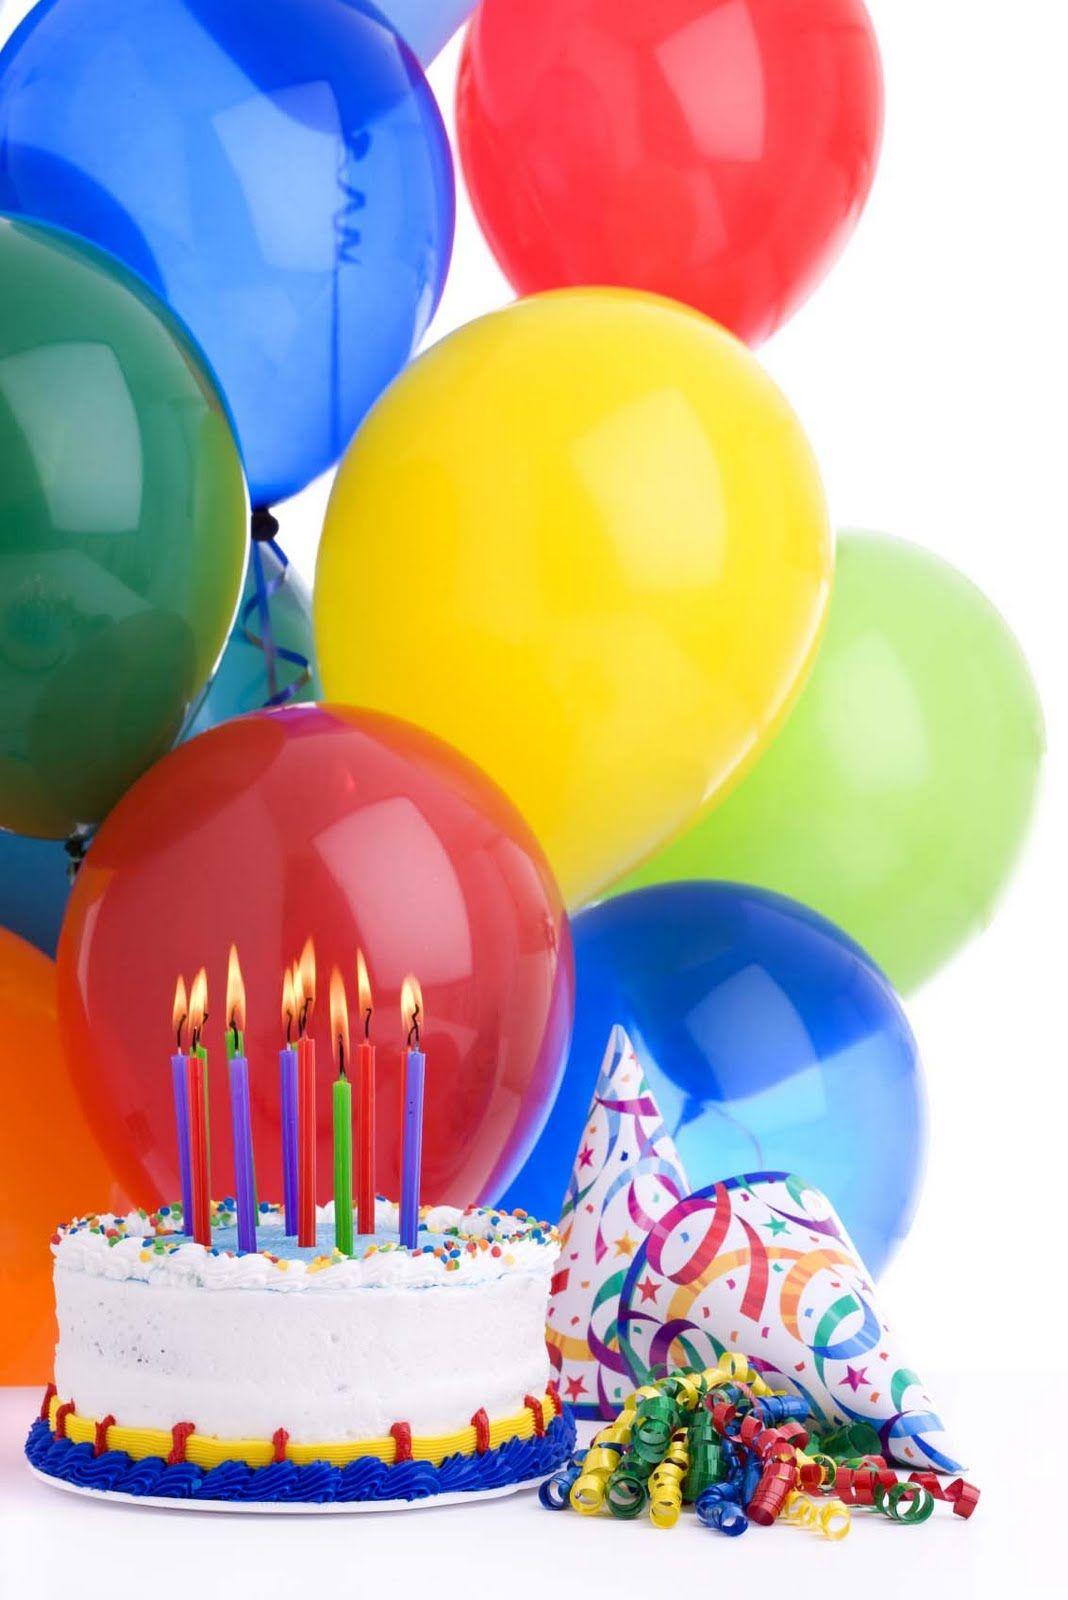 Admirable 30 Elegant Photo Of Birthday Cake And Balloons Birijus Com Funny Birthday Cards Online Elaedamsfinfo